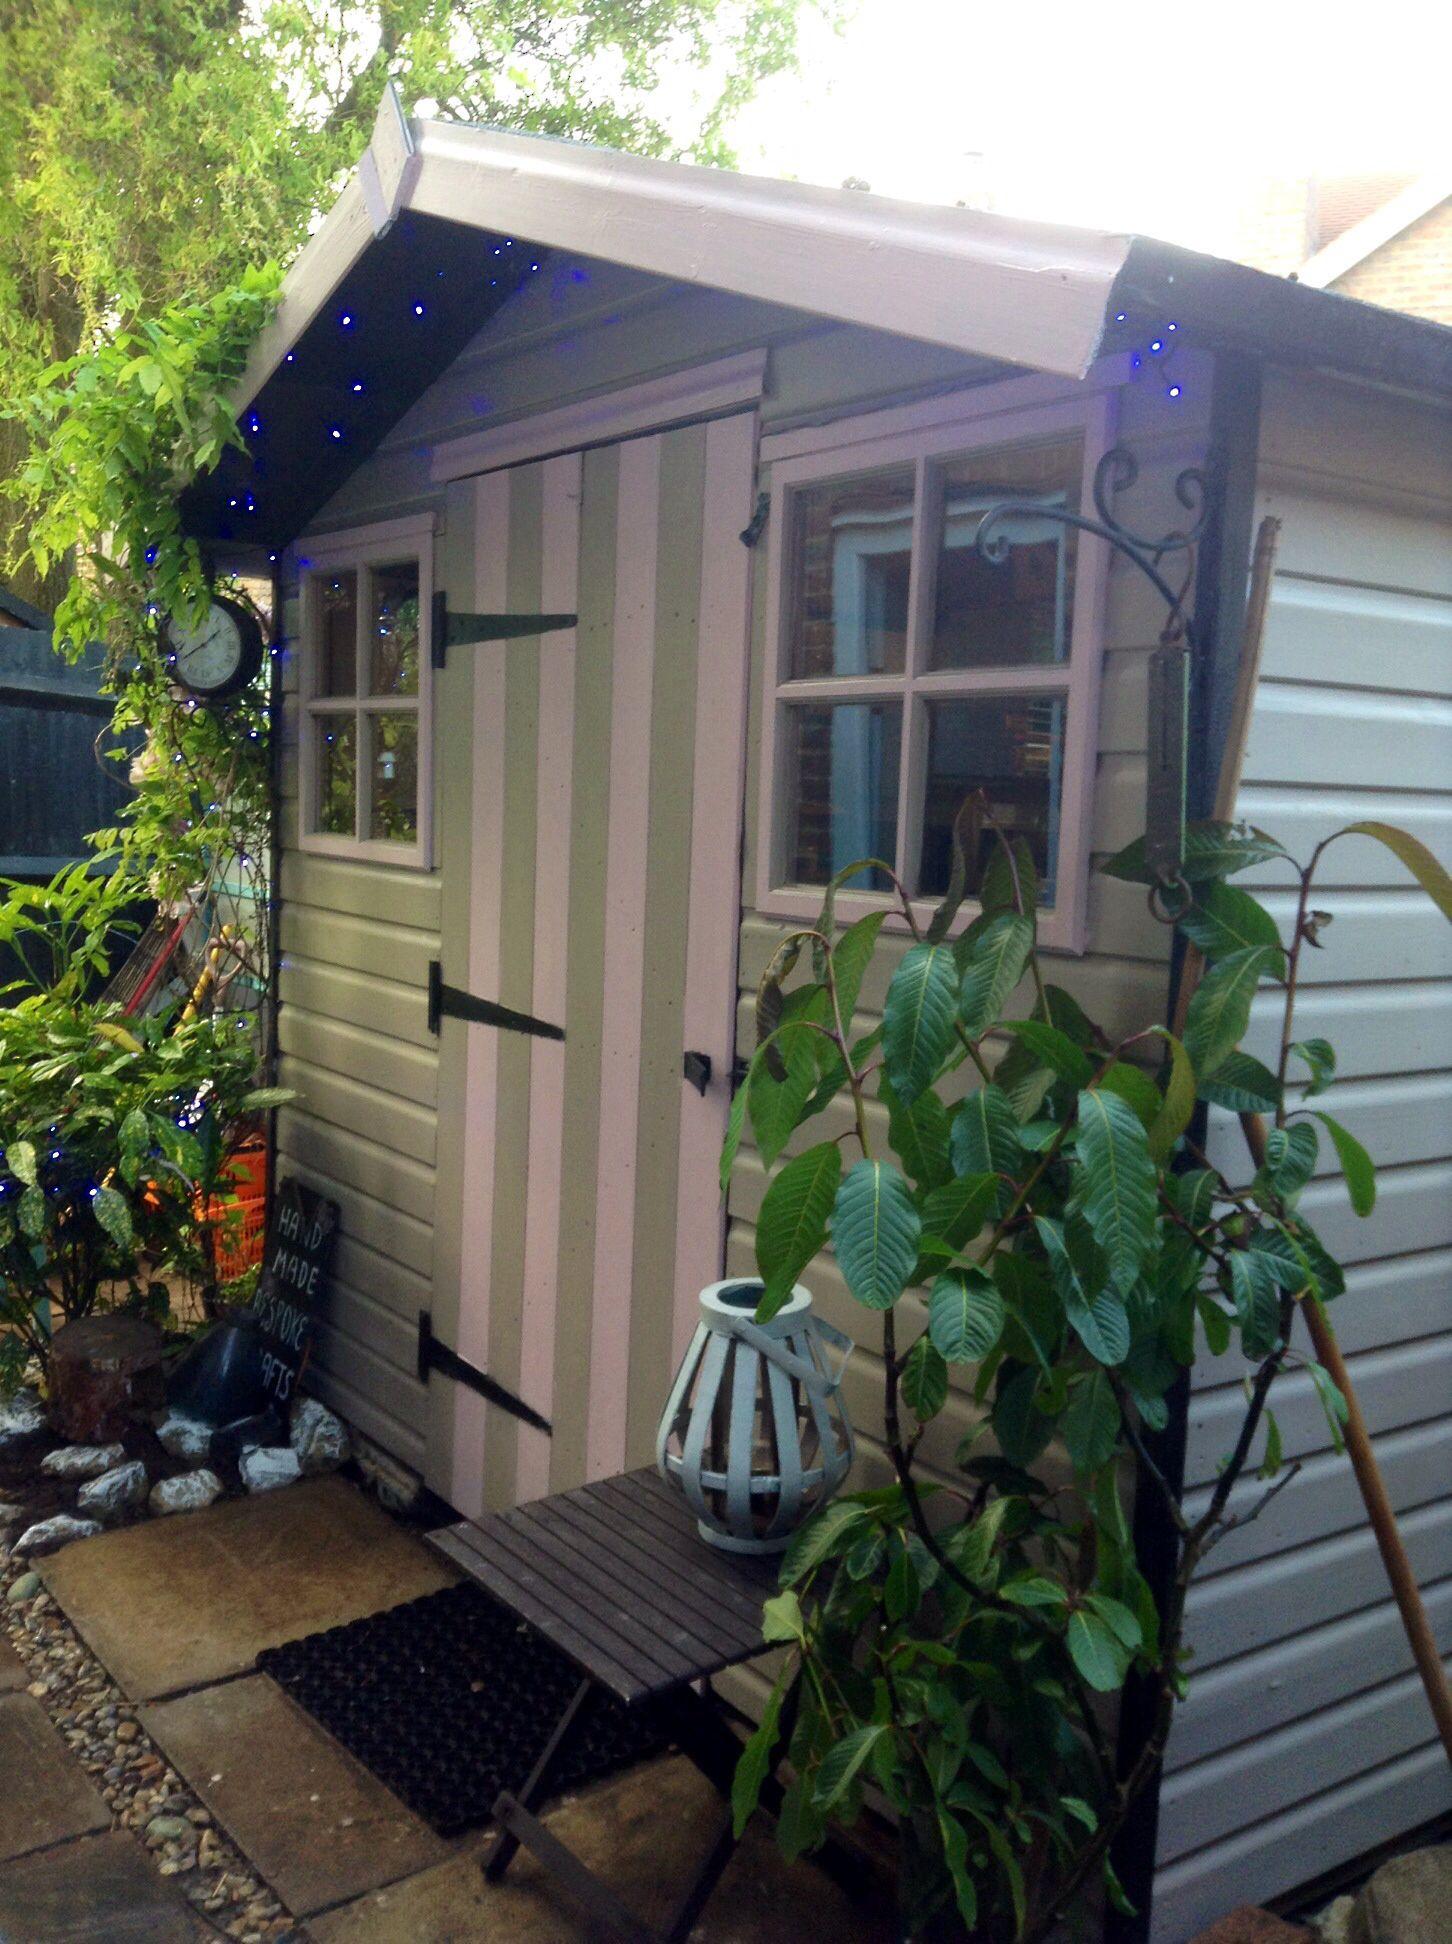 shed in beach hut style garden sheds he shed she shed. Black Bedroom Furniture Sets. Home Design Ideas